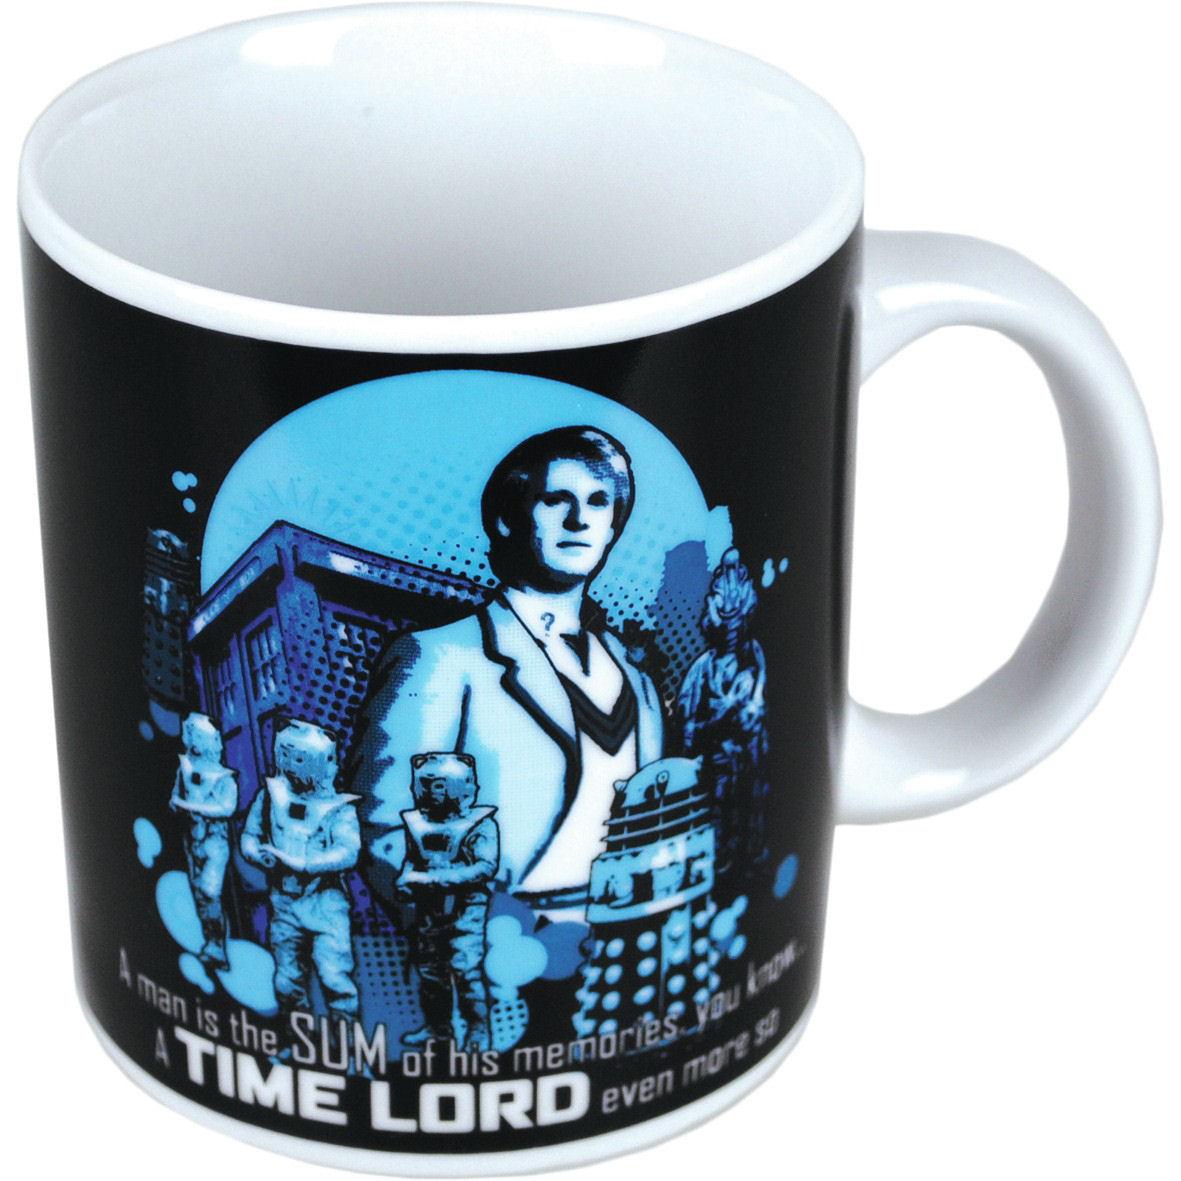 lrgscaleboxed-mug-fifth-doctor-who-peter-davidson.jpg